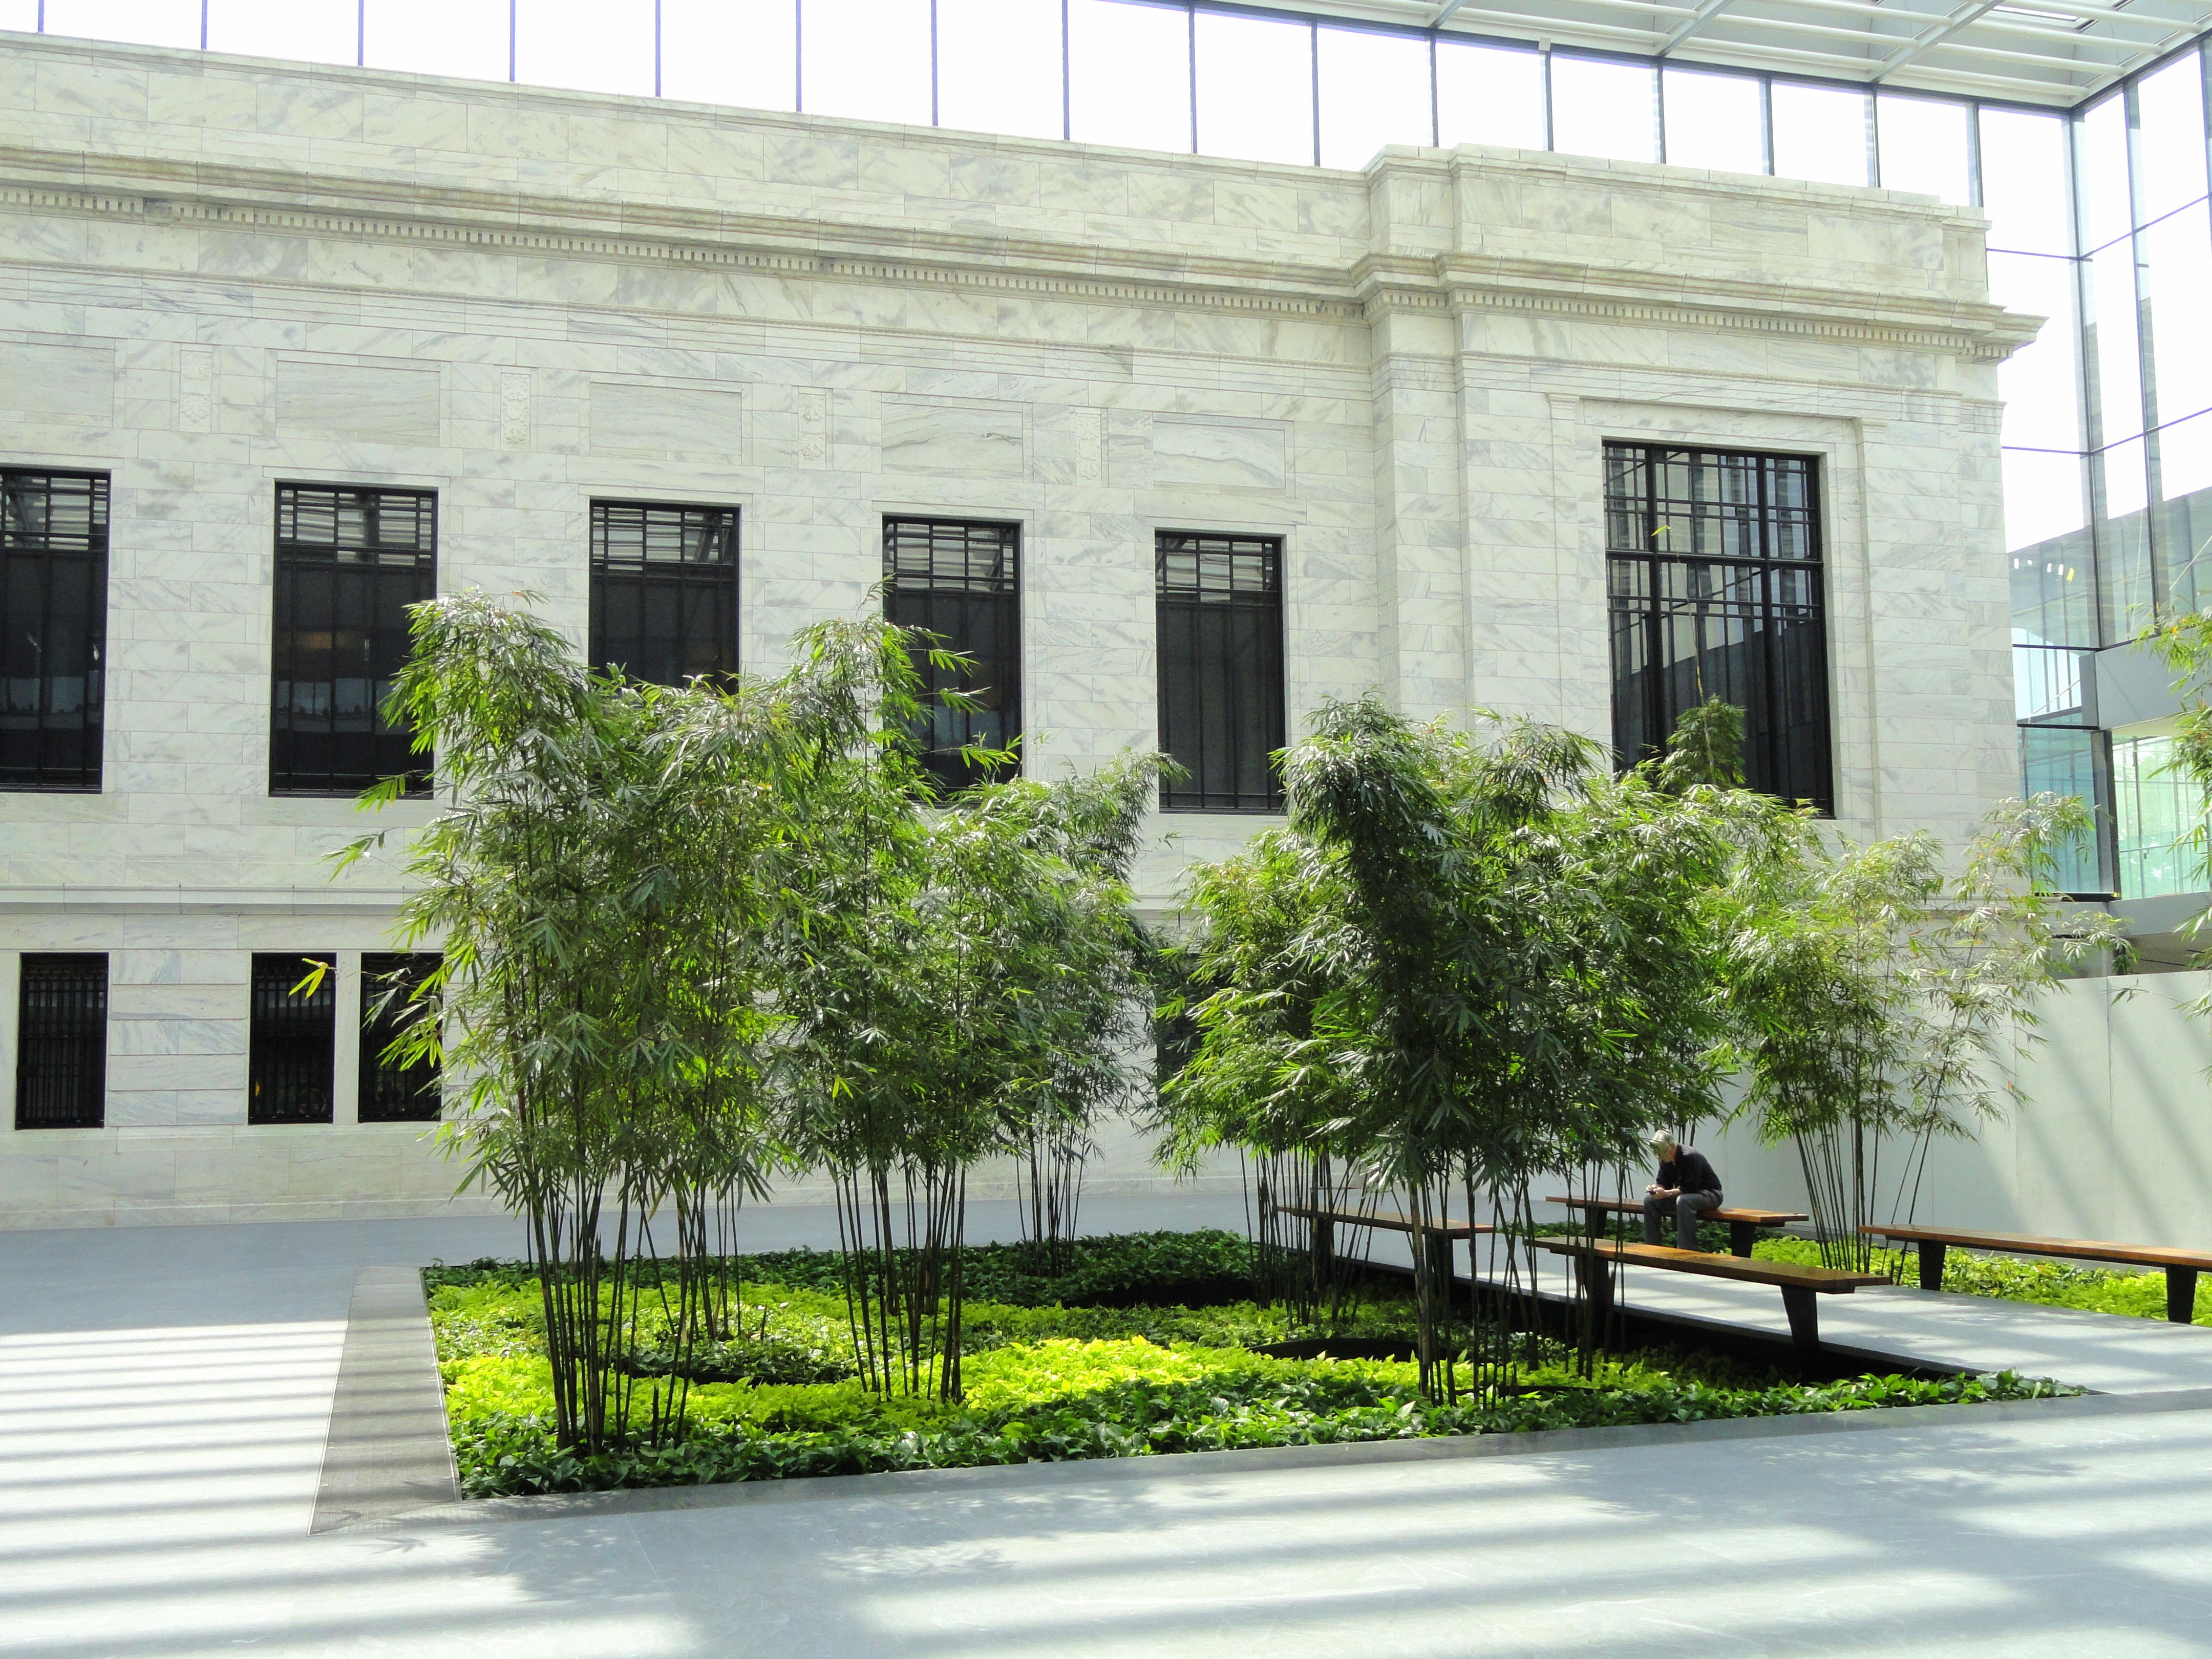 FileInterior Courtyard Cleveland Museum Of Art